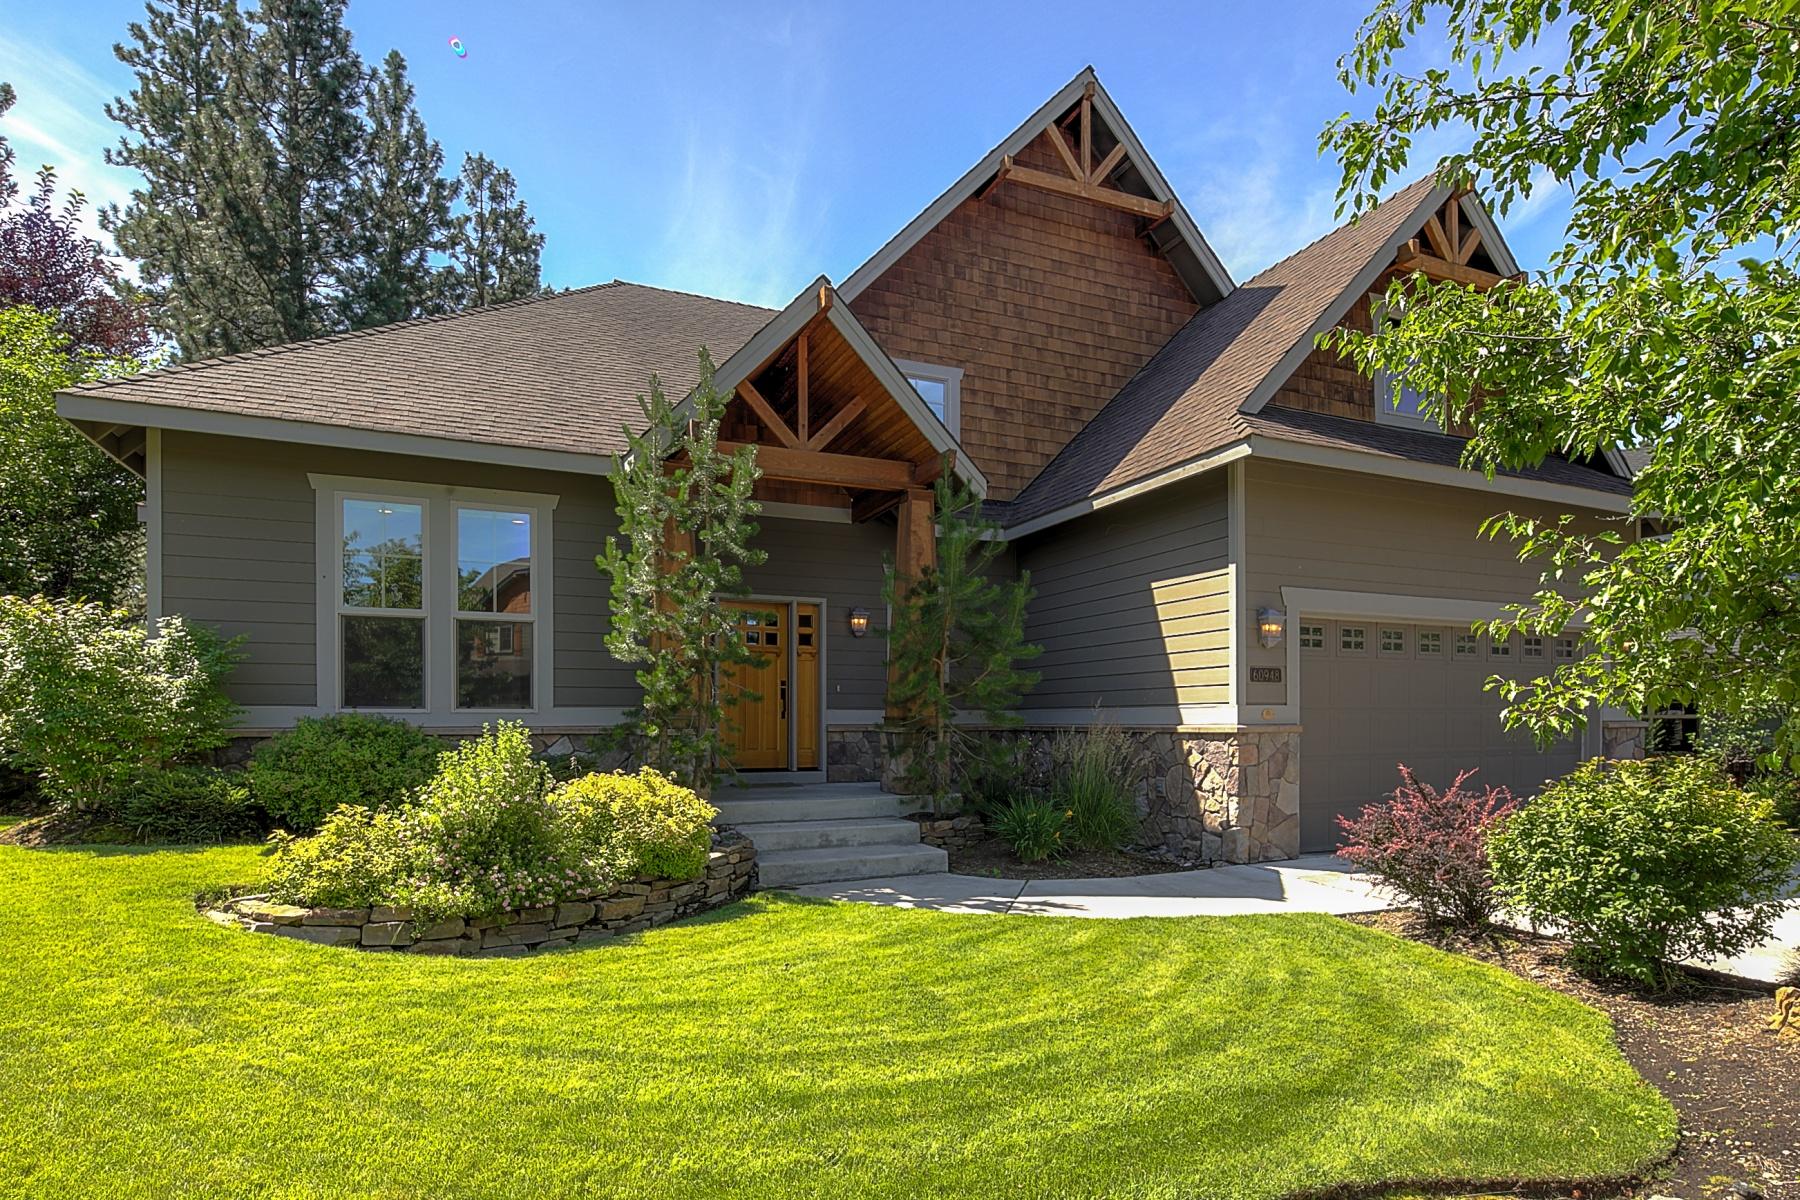 Property For Sale at 60948 Creekstone Loop, BEND